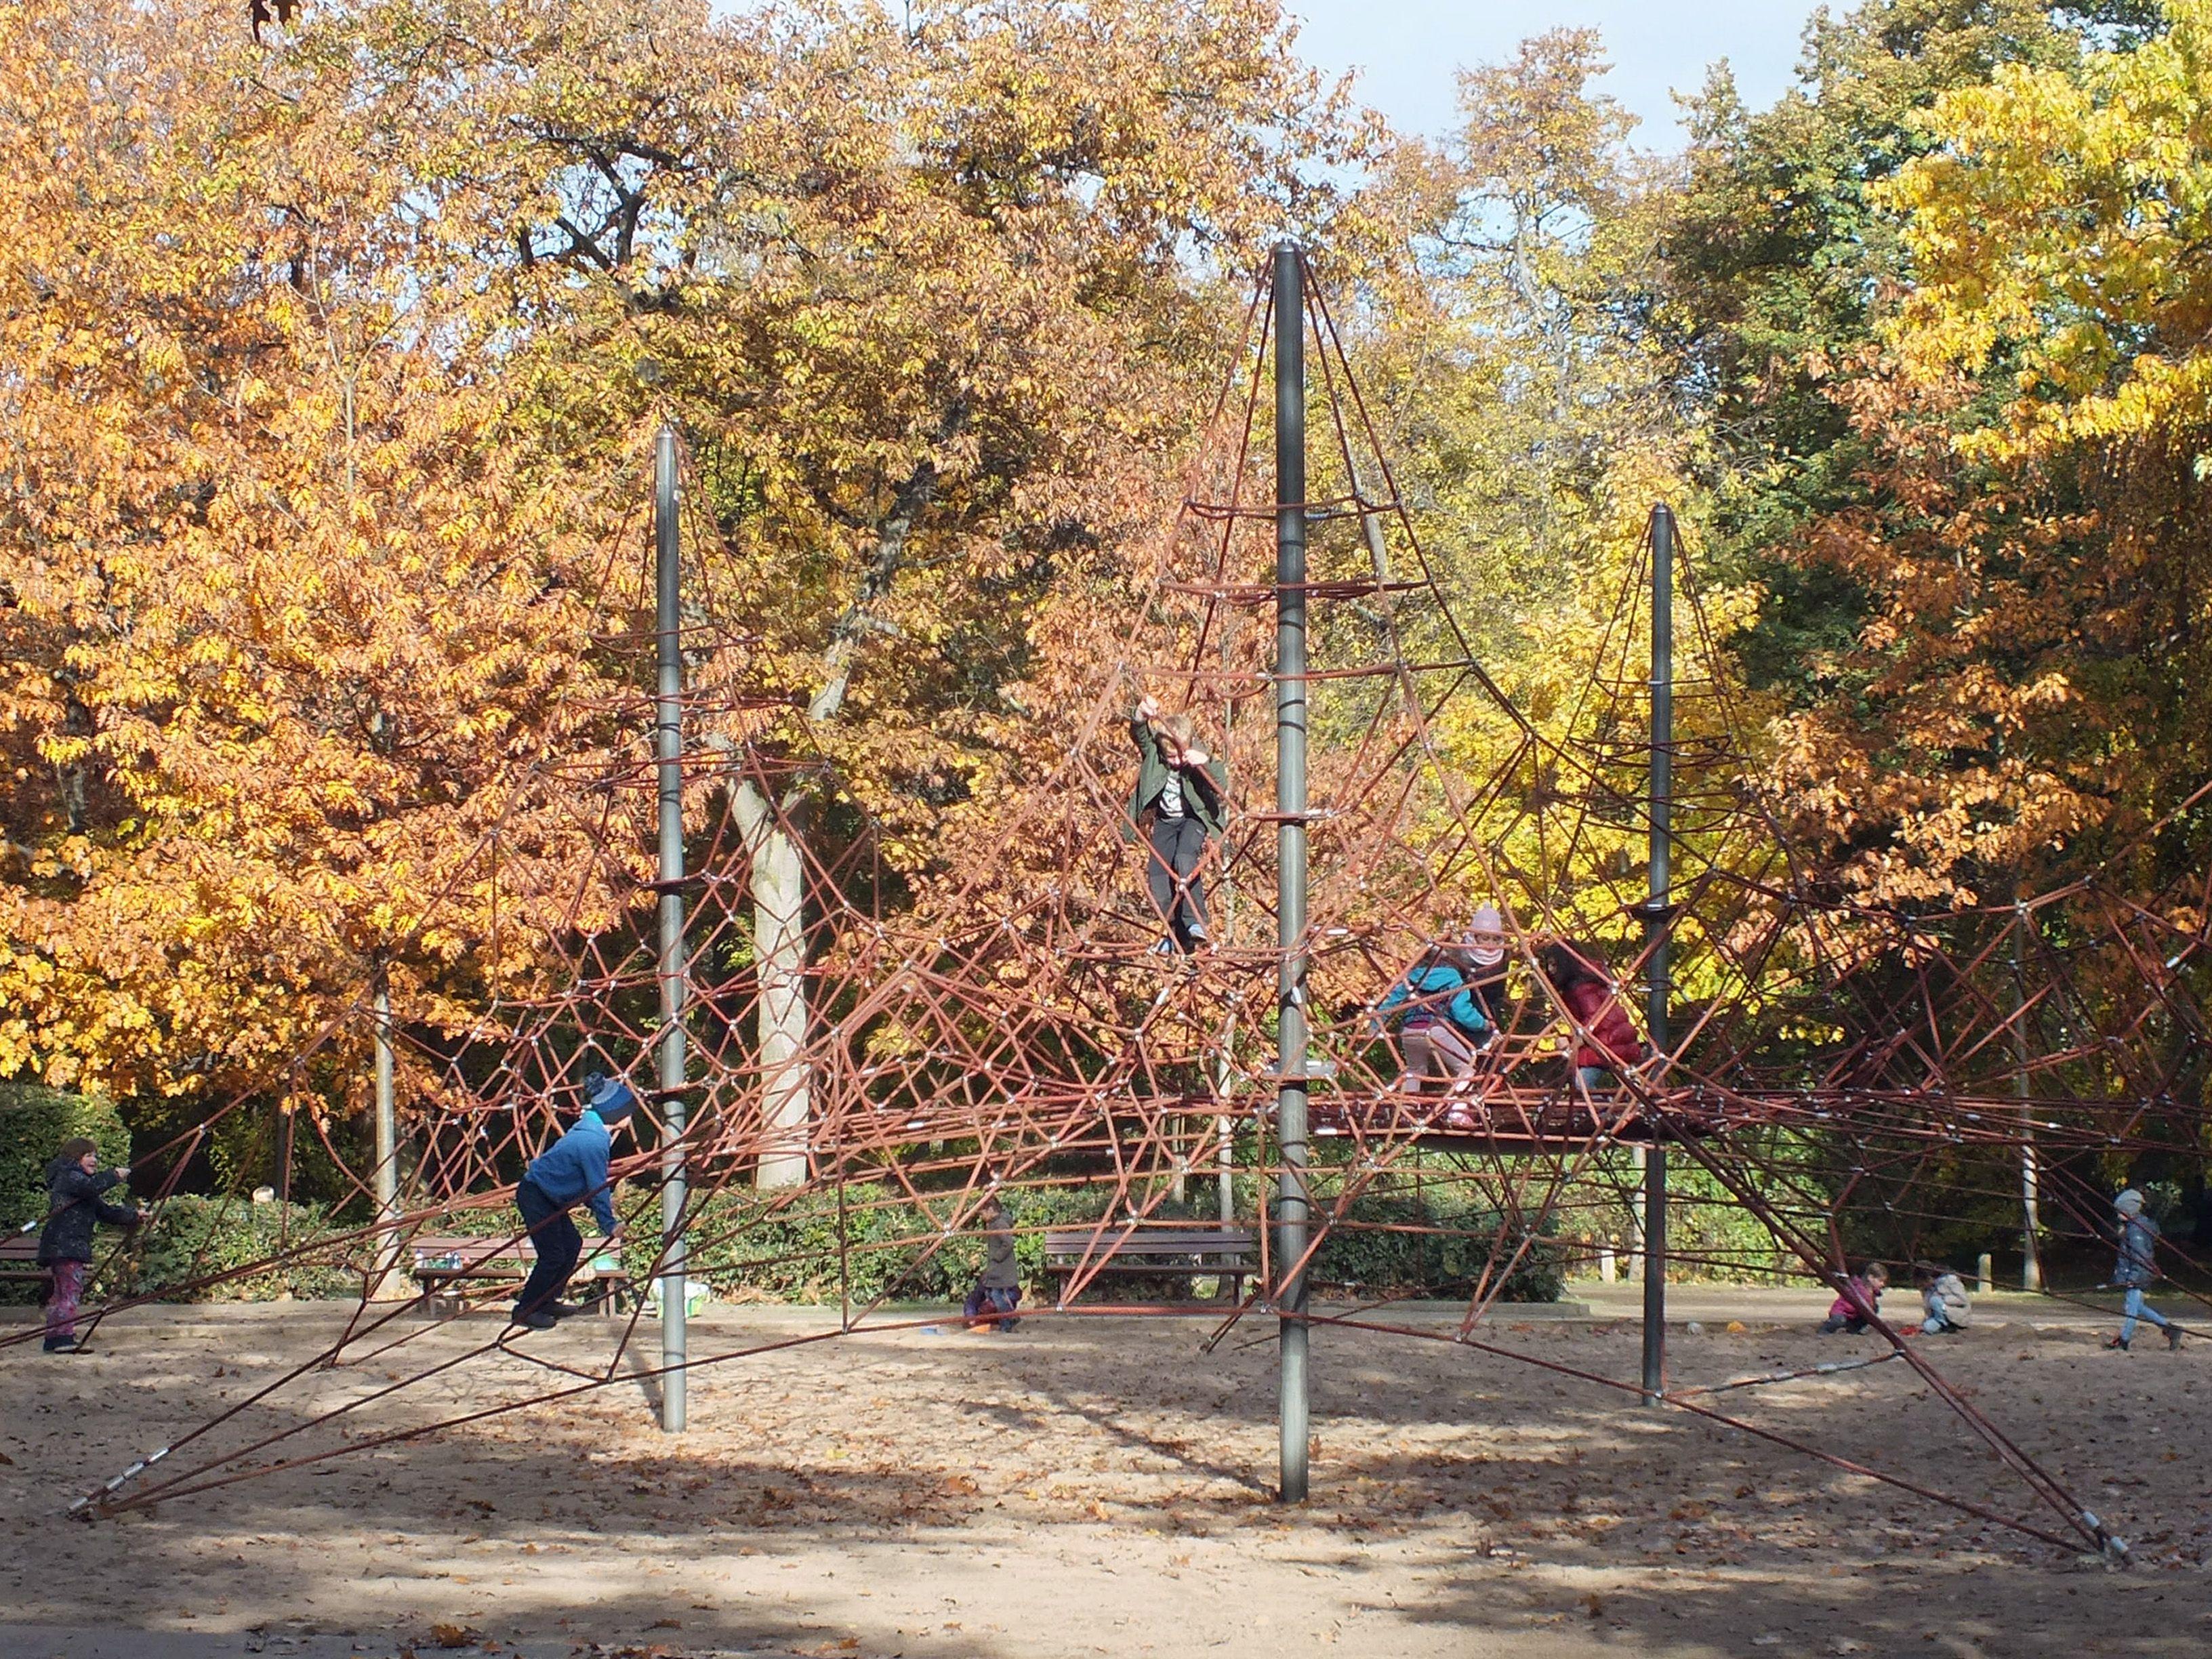 Klettergerüst Wikipedia : Datei lzg eutr park klettergerüst g u wikipedia